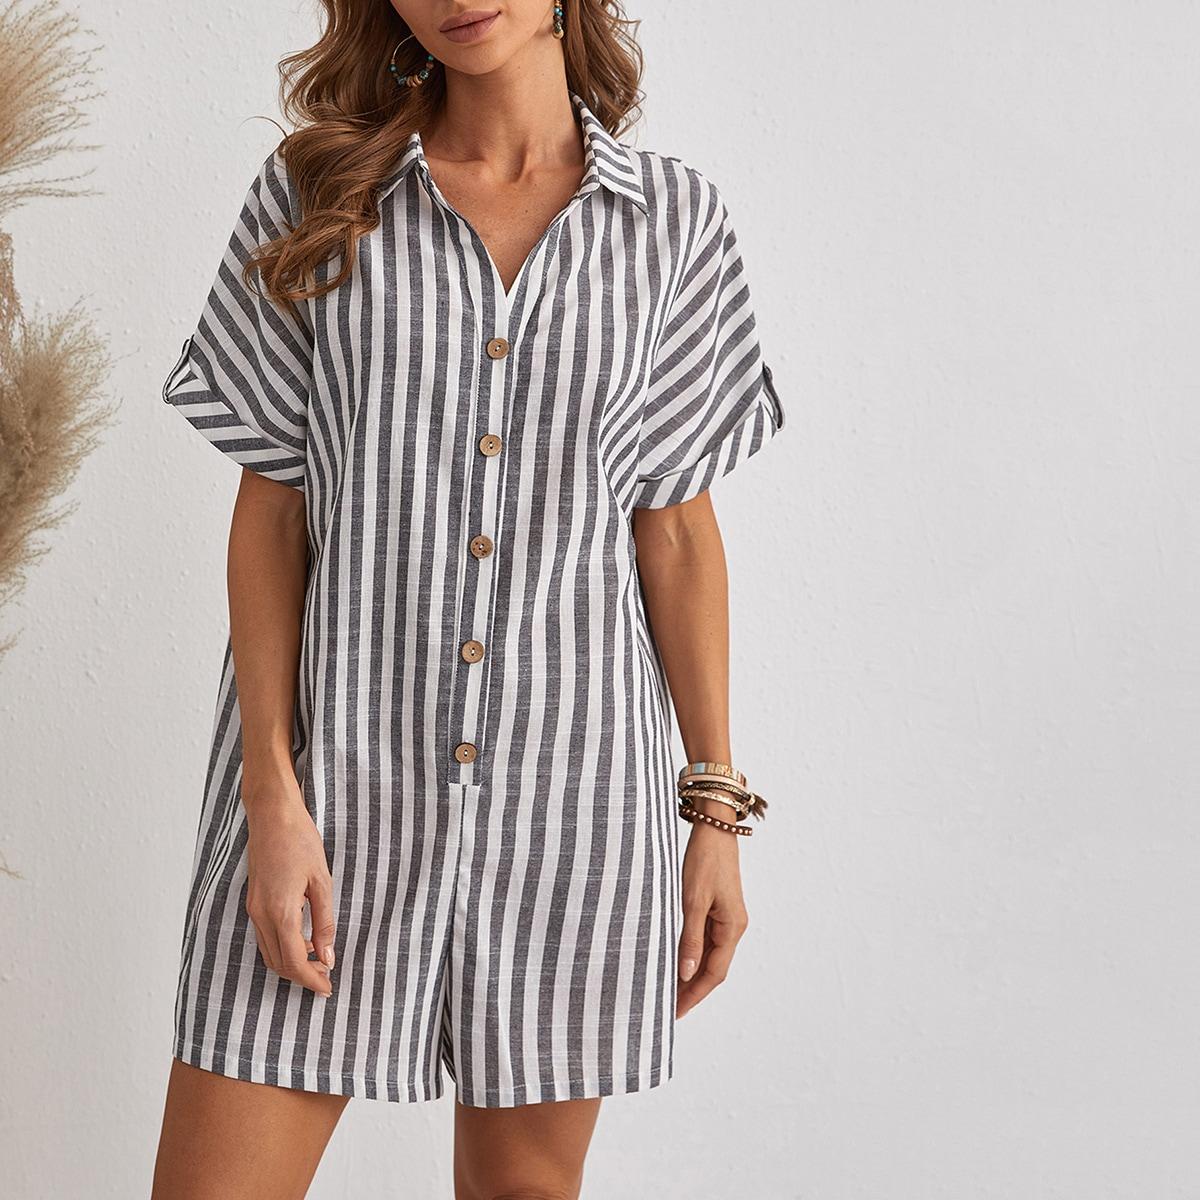 Roll Tab Sleeve Two Tone Striped Shirt Romper